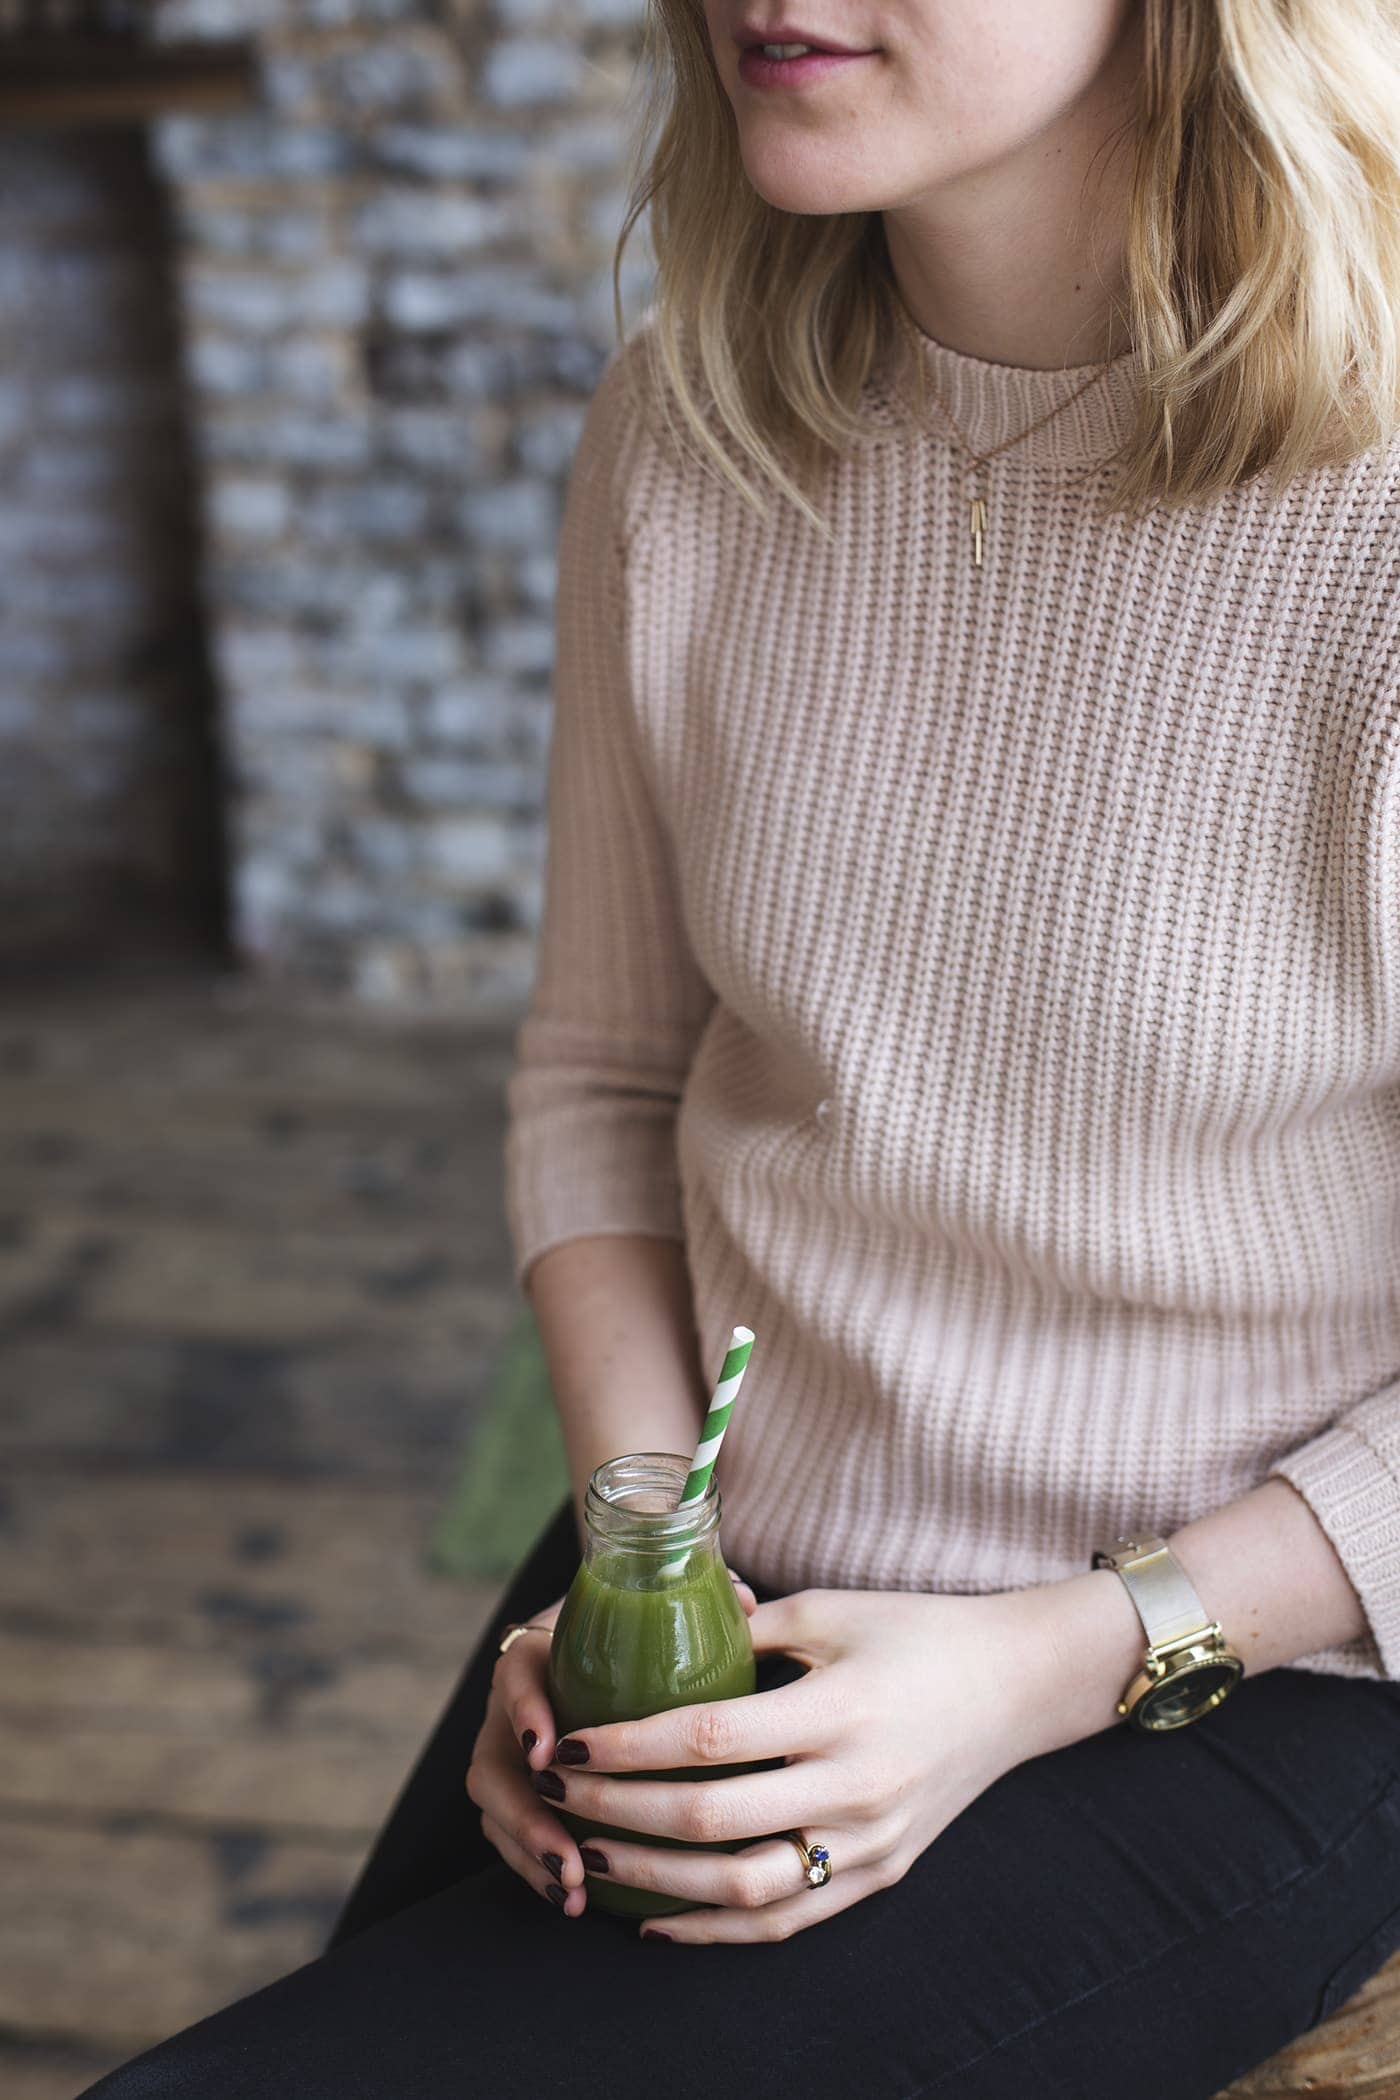 London staycation | Brickwood Coffee lunhc | mini break